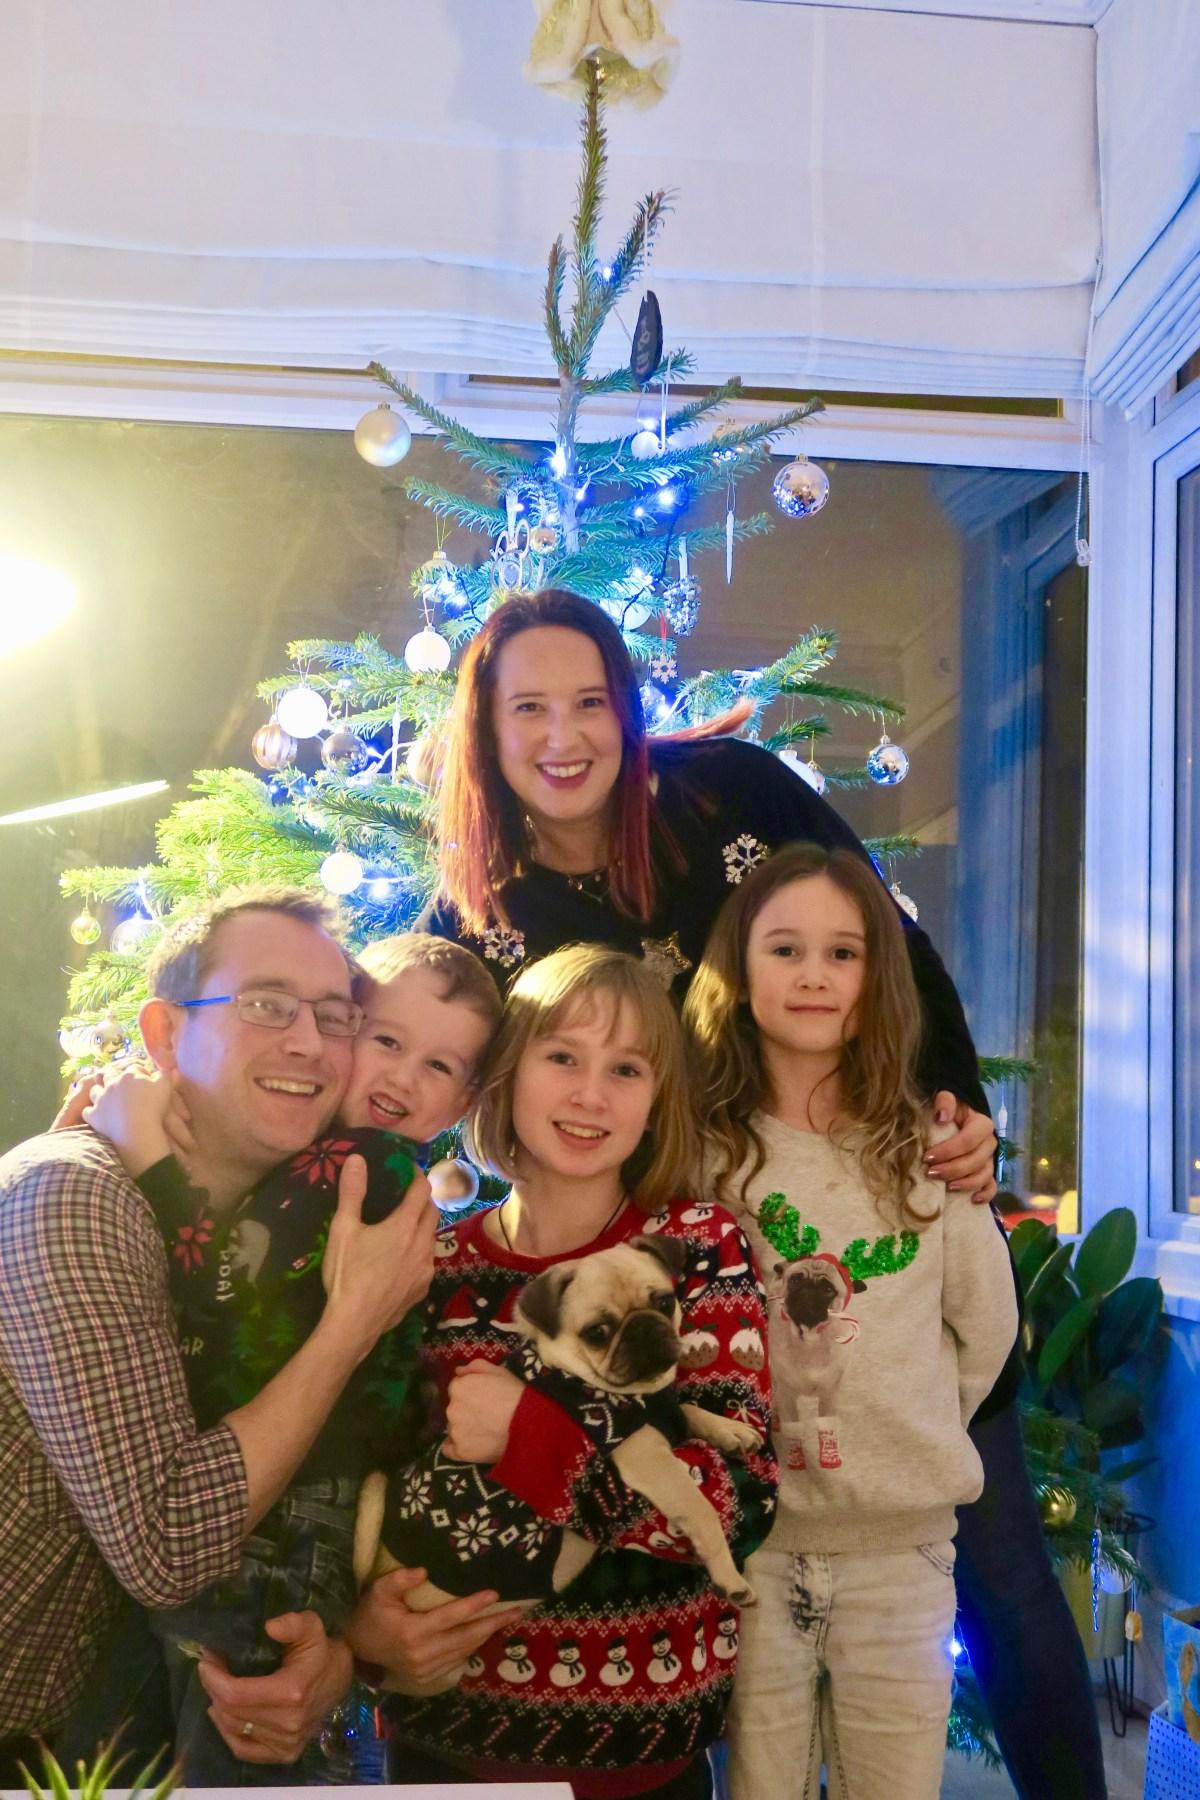 family photo december 2018